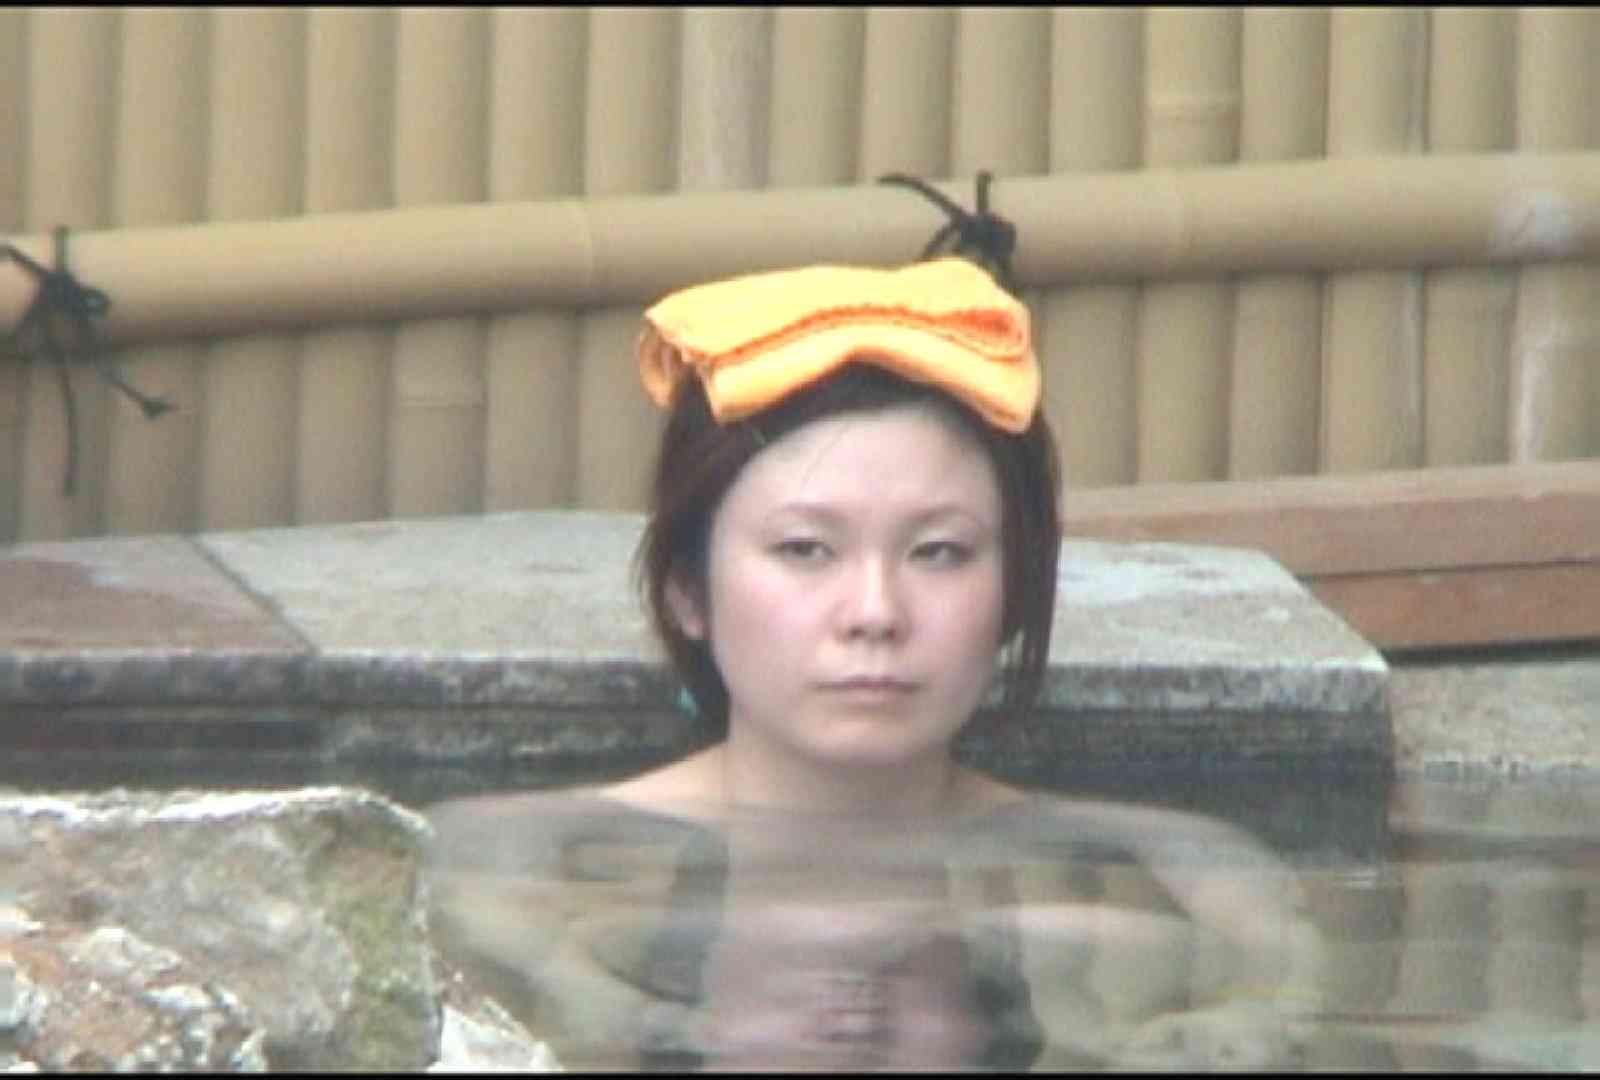 Aquaな露天風呂Vol.177 綺麗なOLたち アダルト動画キャプチャ 112枚 101